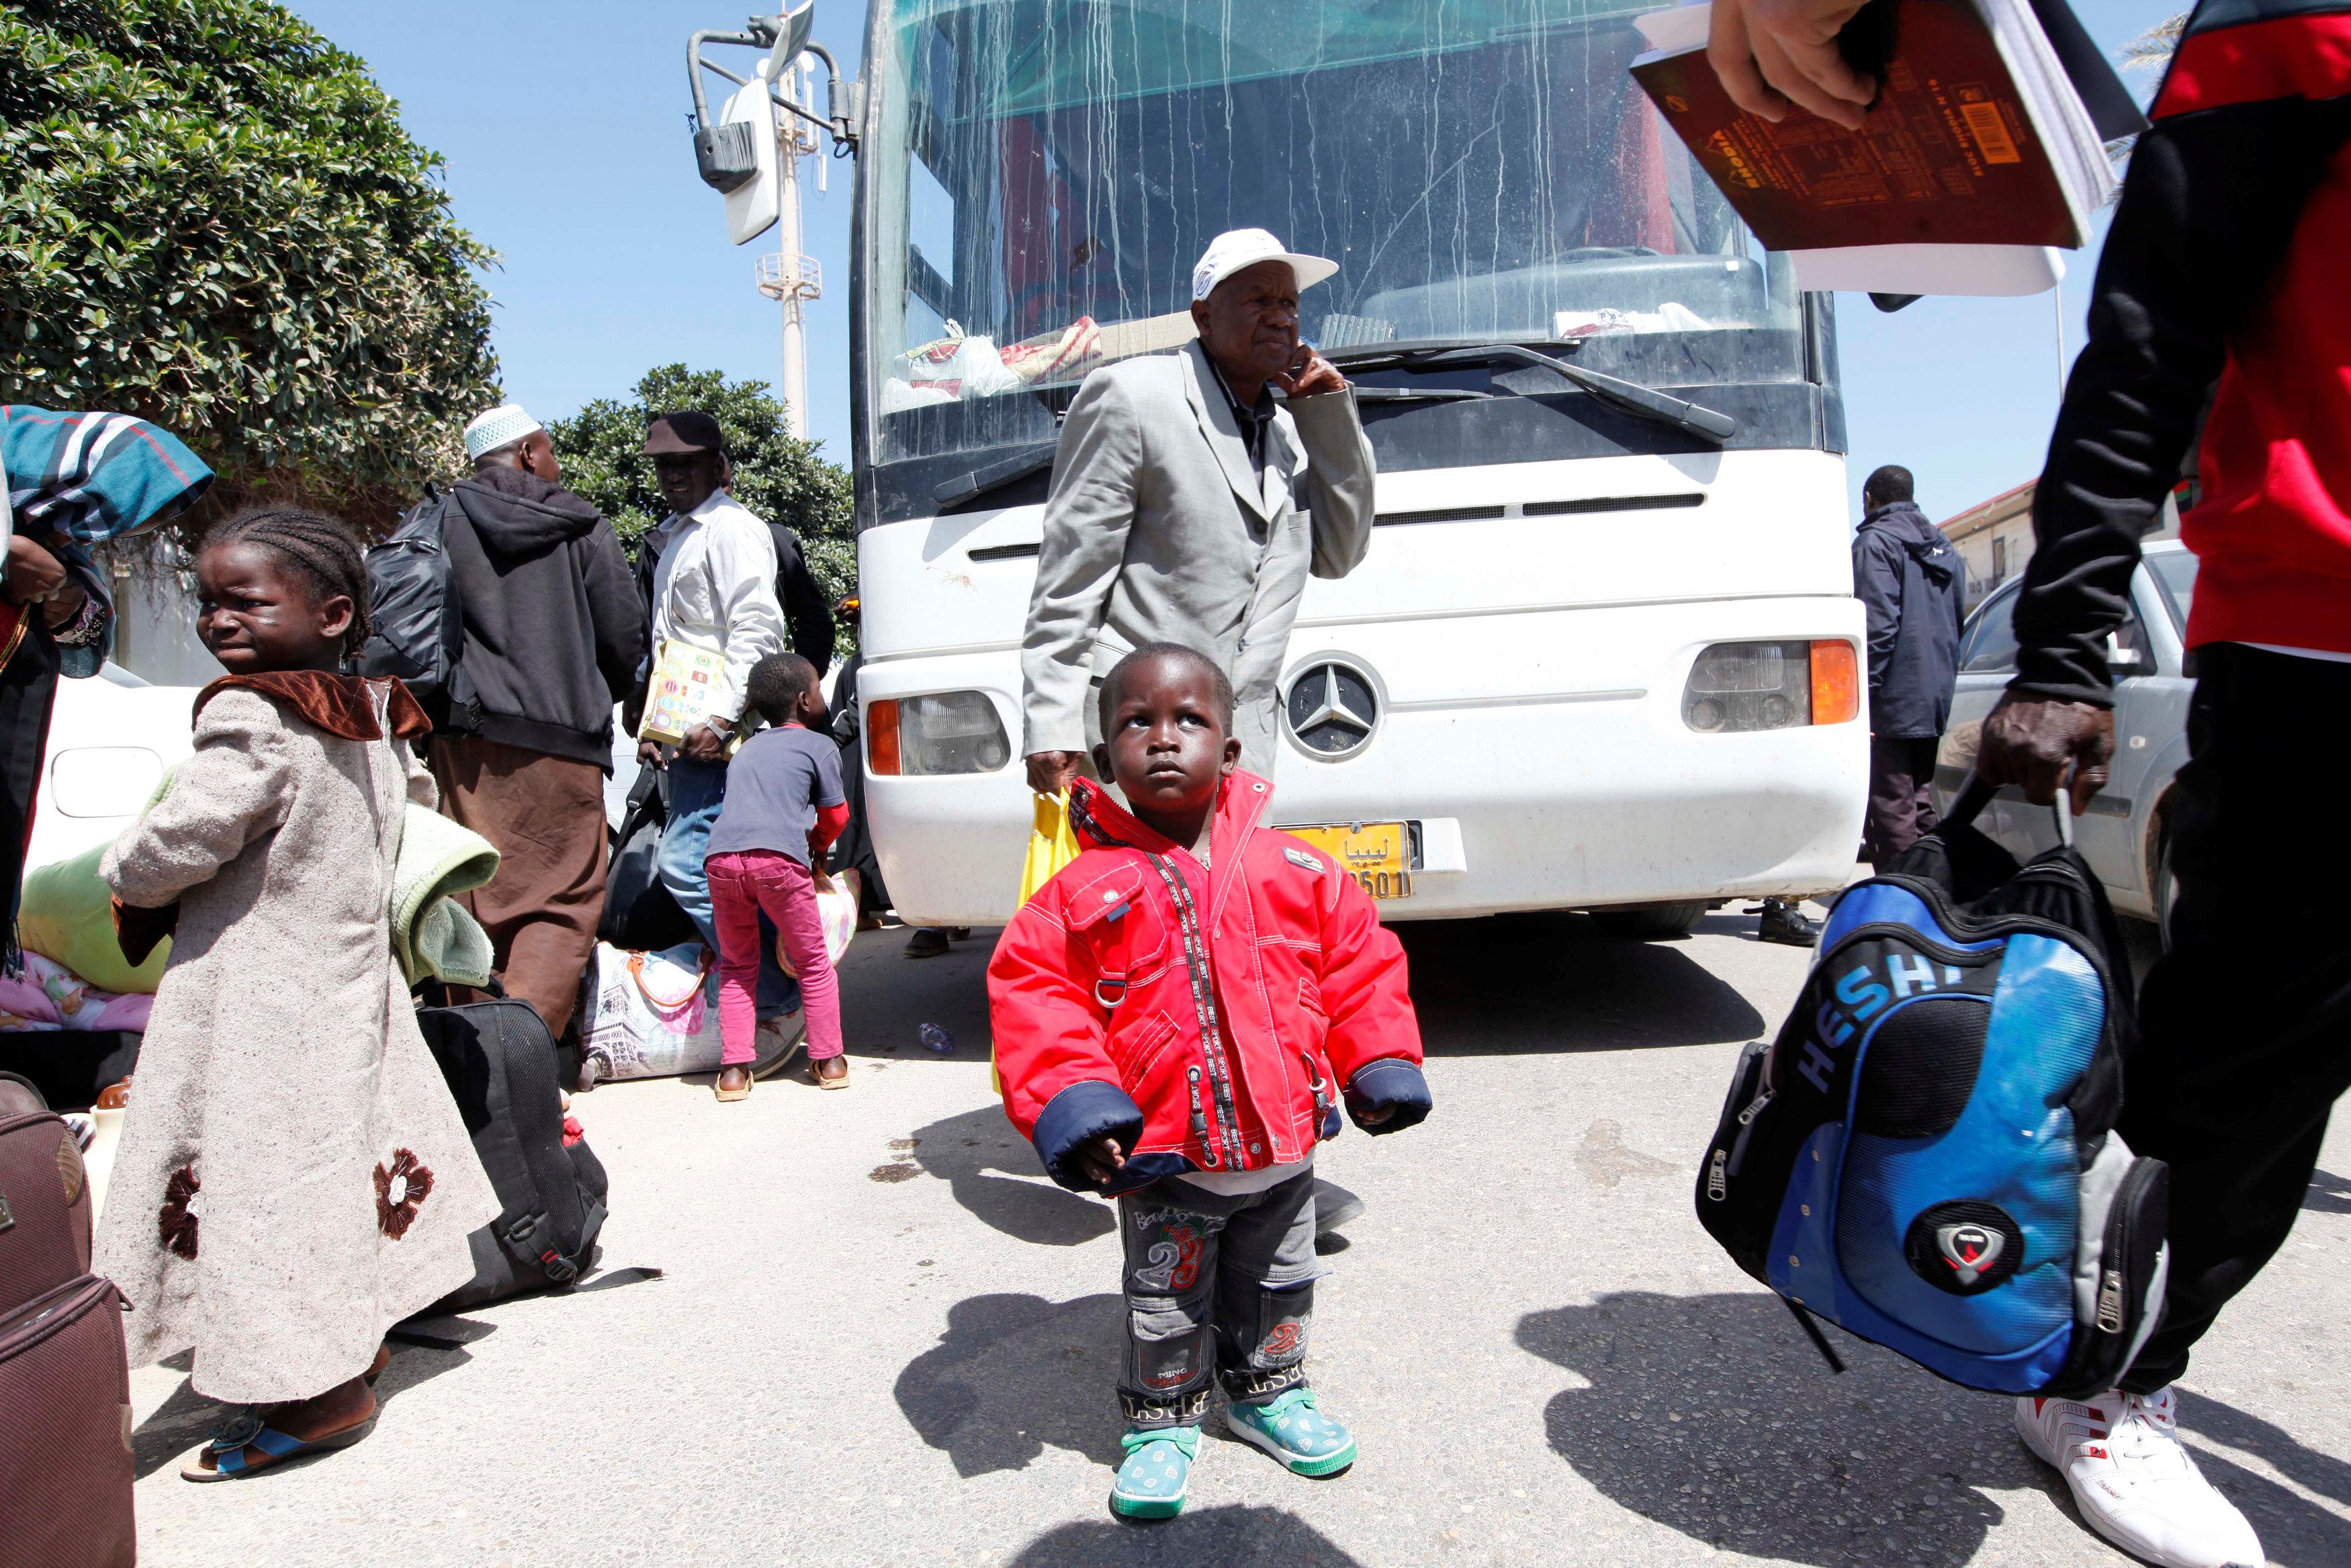 Libya fishermen find 28 dead migrants in boat offshore - official